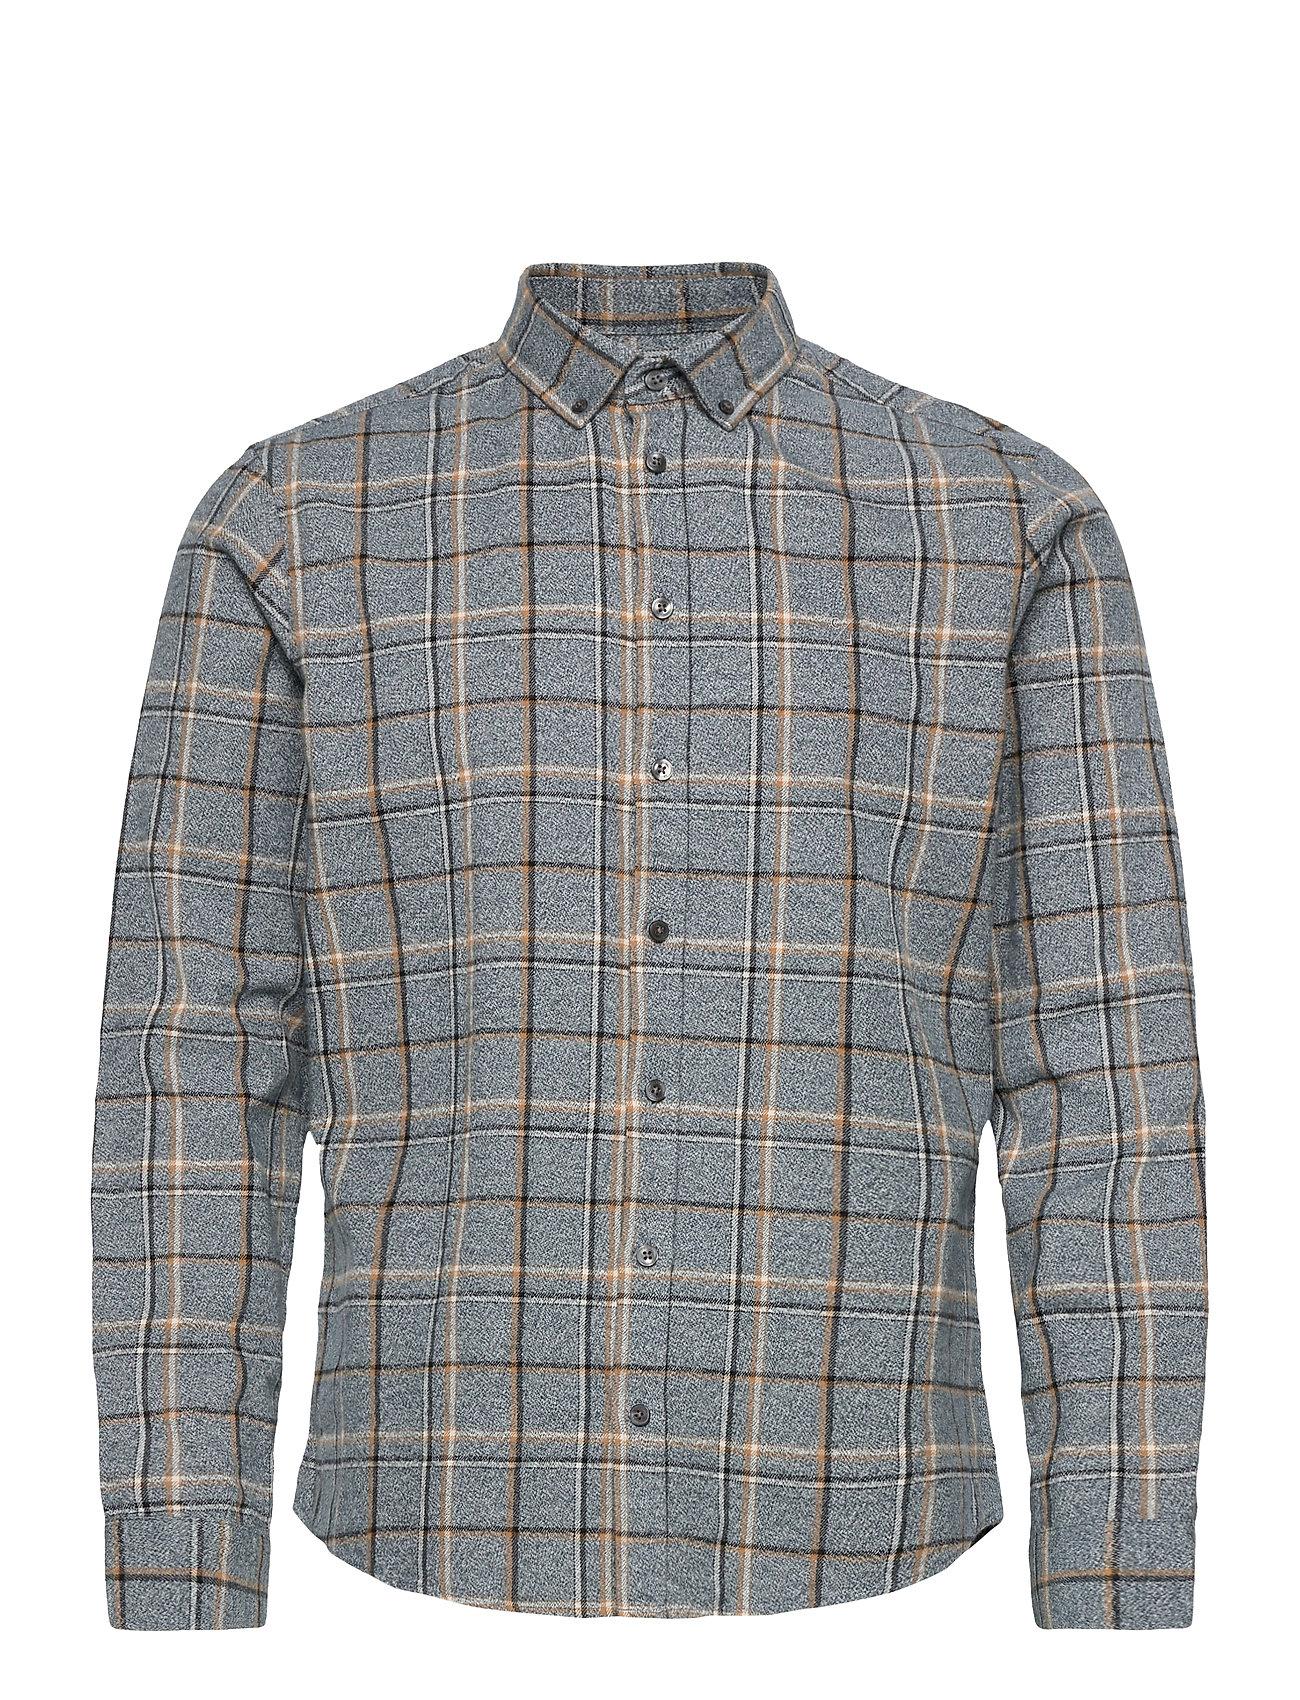 Image of Anton Bd Ls Shirt Skjorte Casual Grå Casual Friday (3461977209)